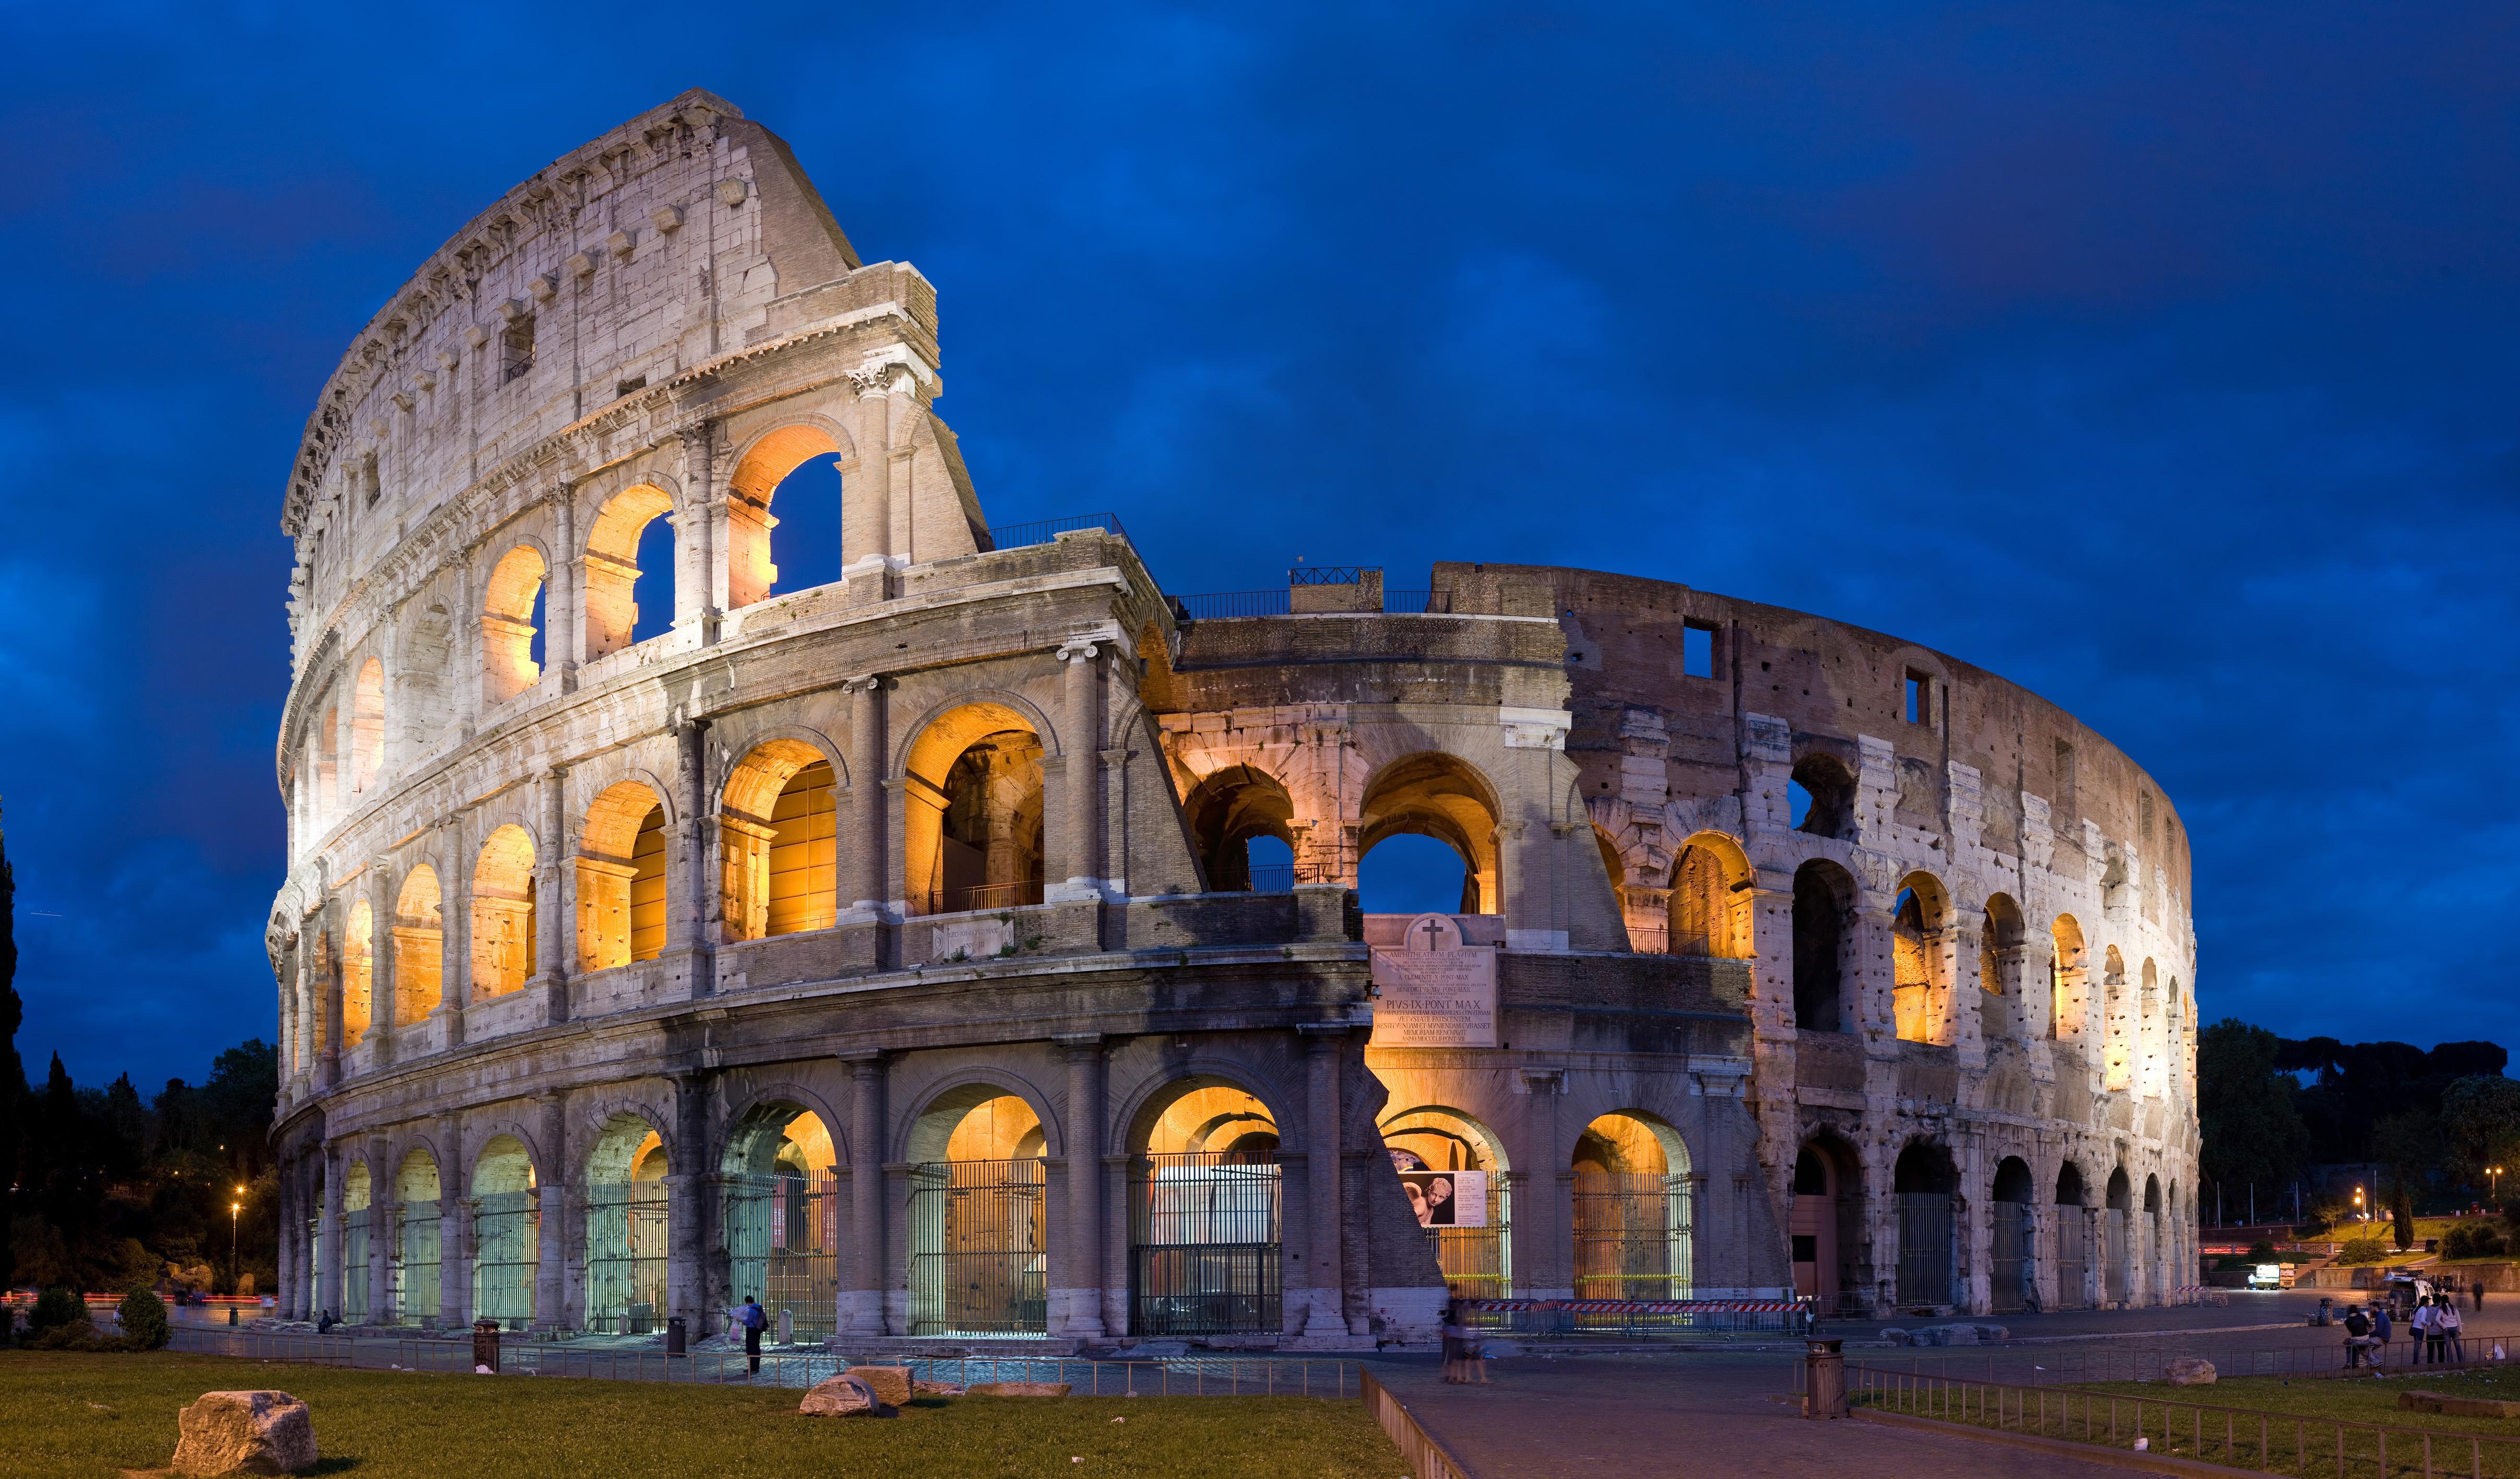 Colosseum Underground Afternoon Tour